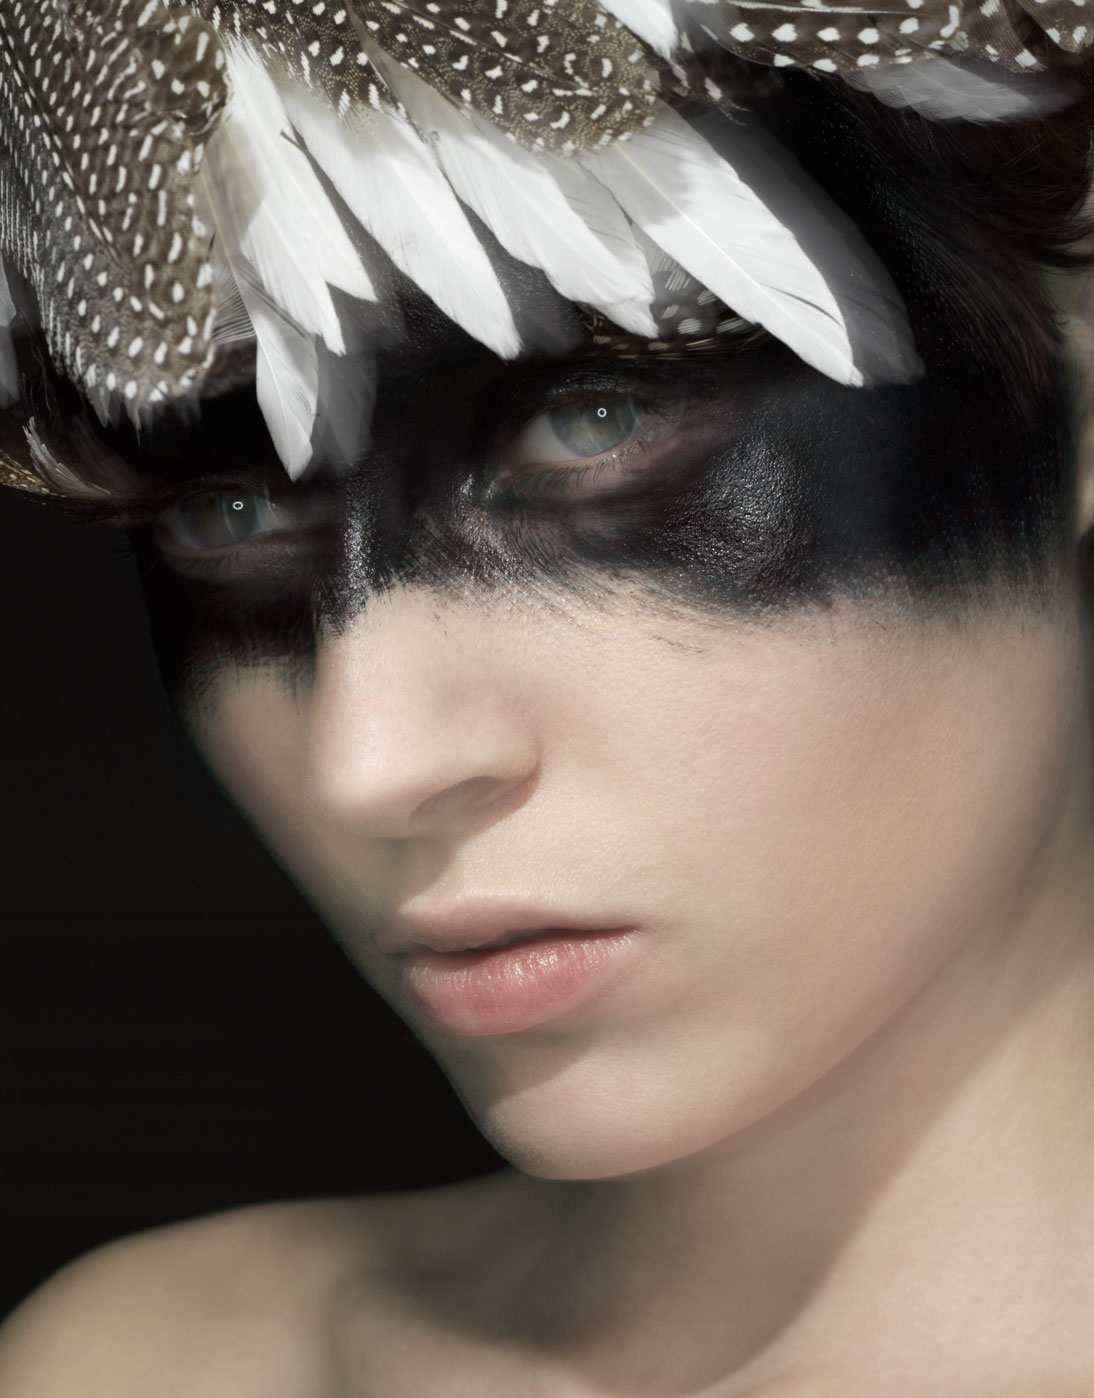 frayed-black-eye-mask-beauty.jpg